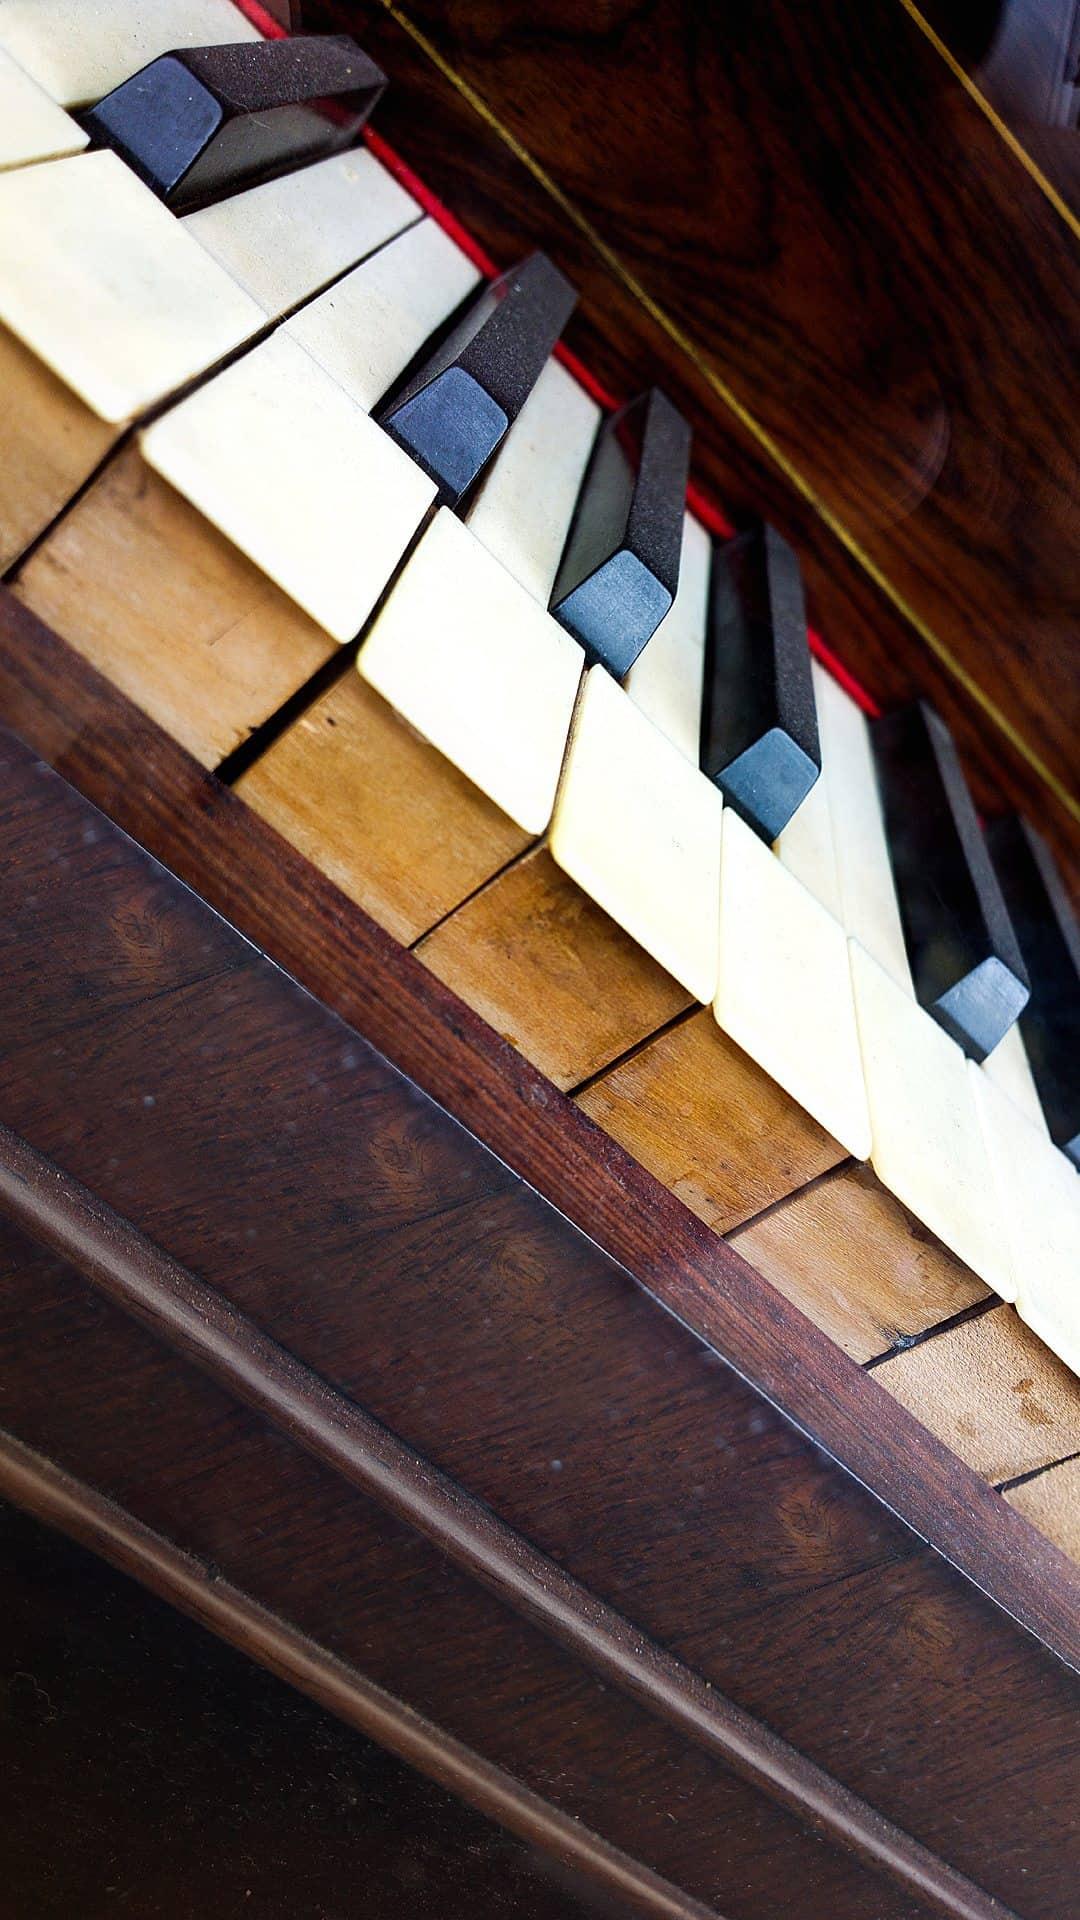 old-piano-keys-android-wallpaper